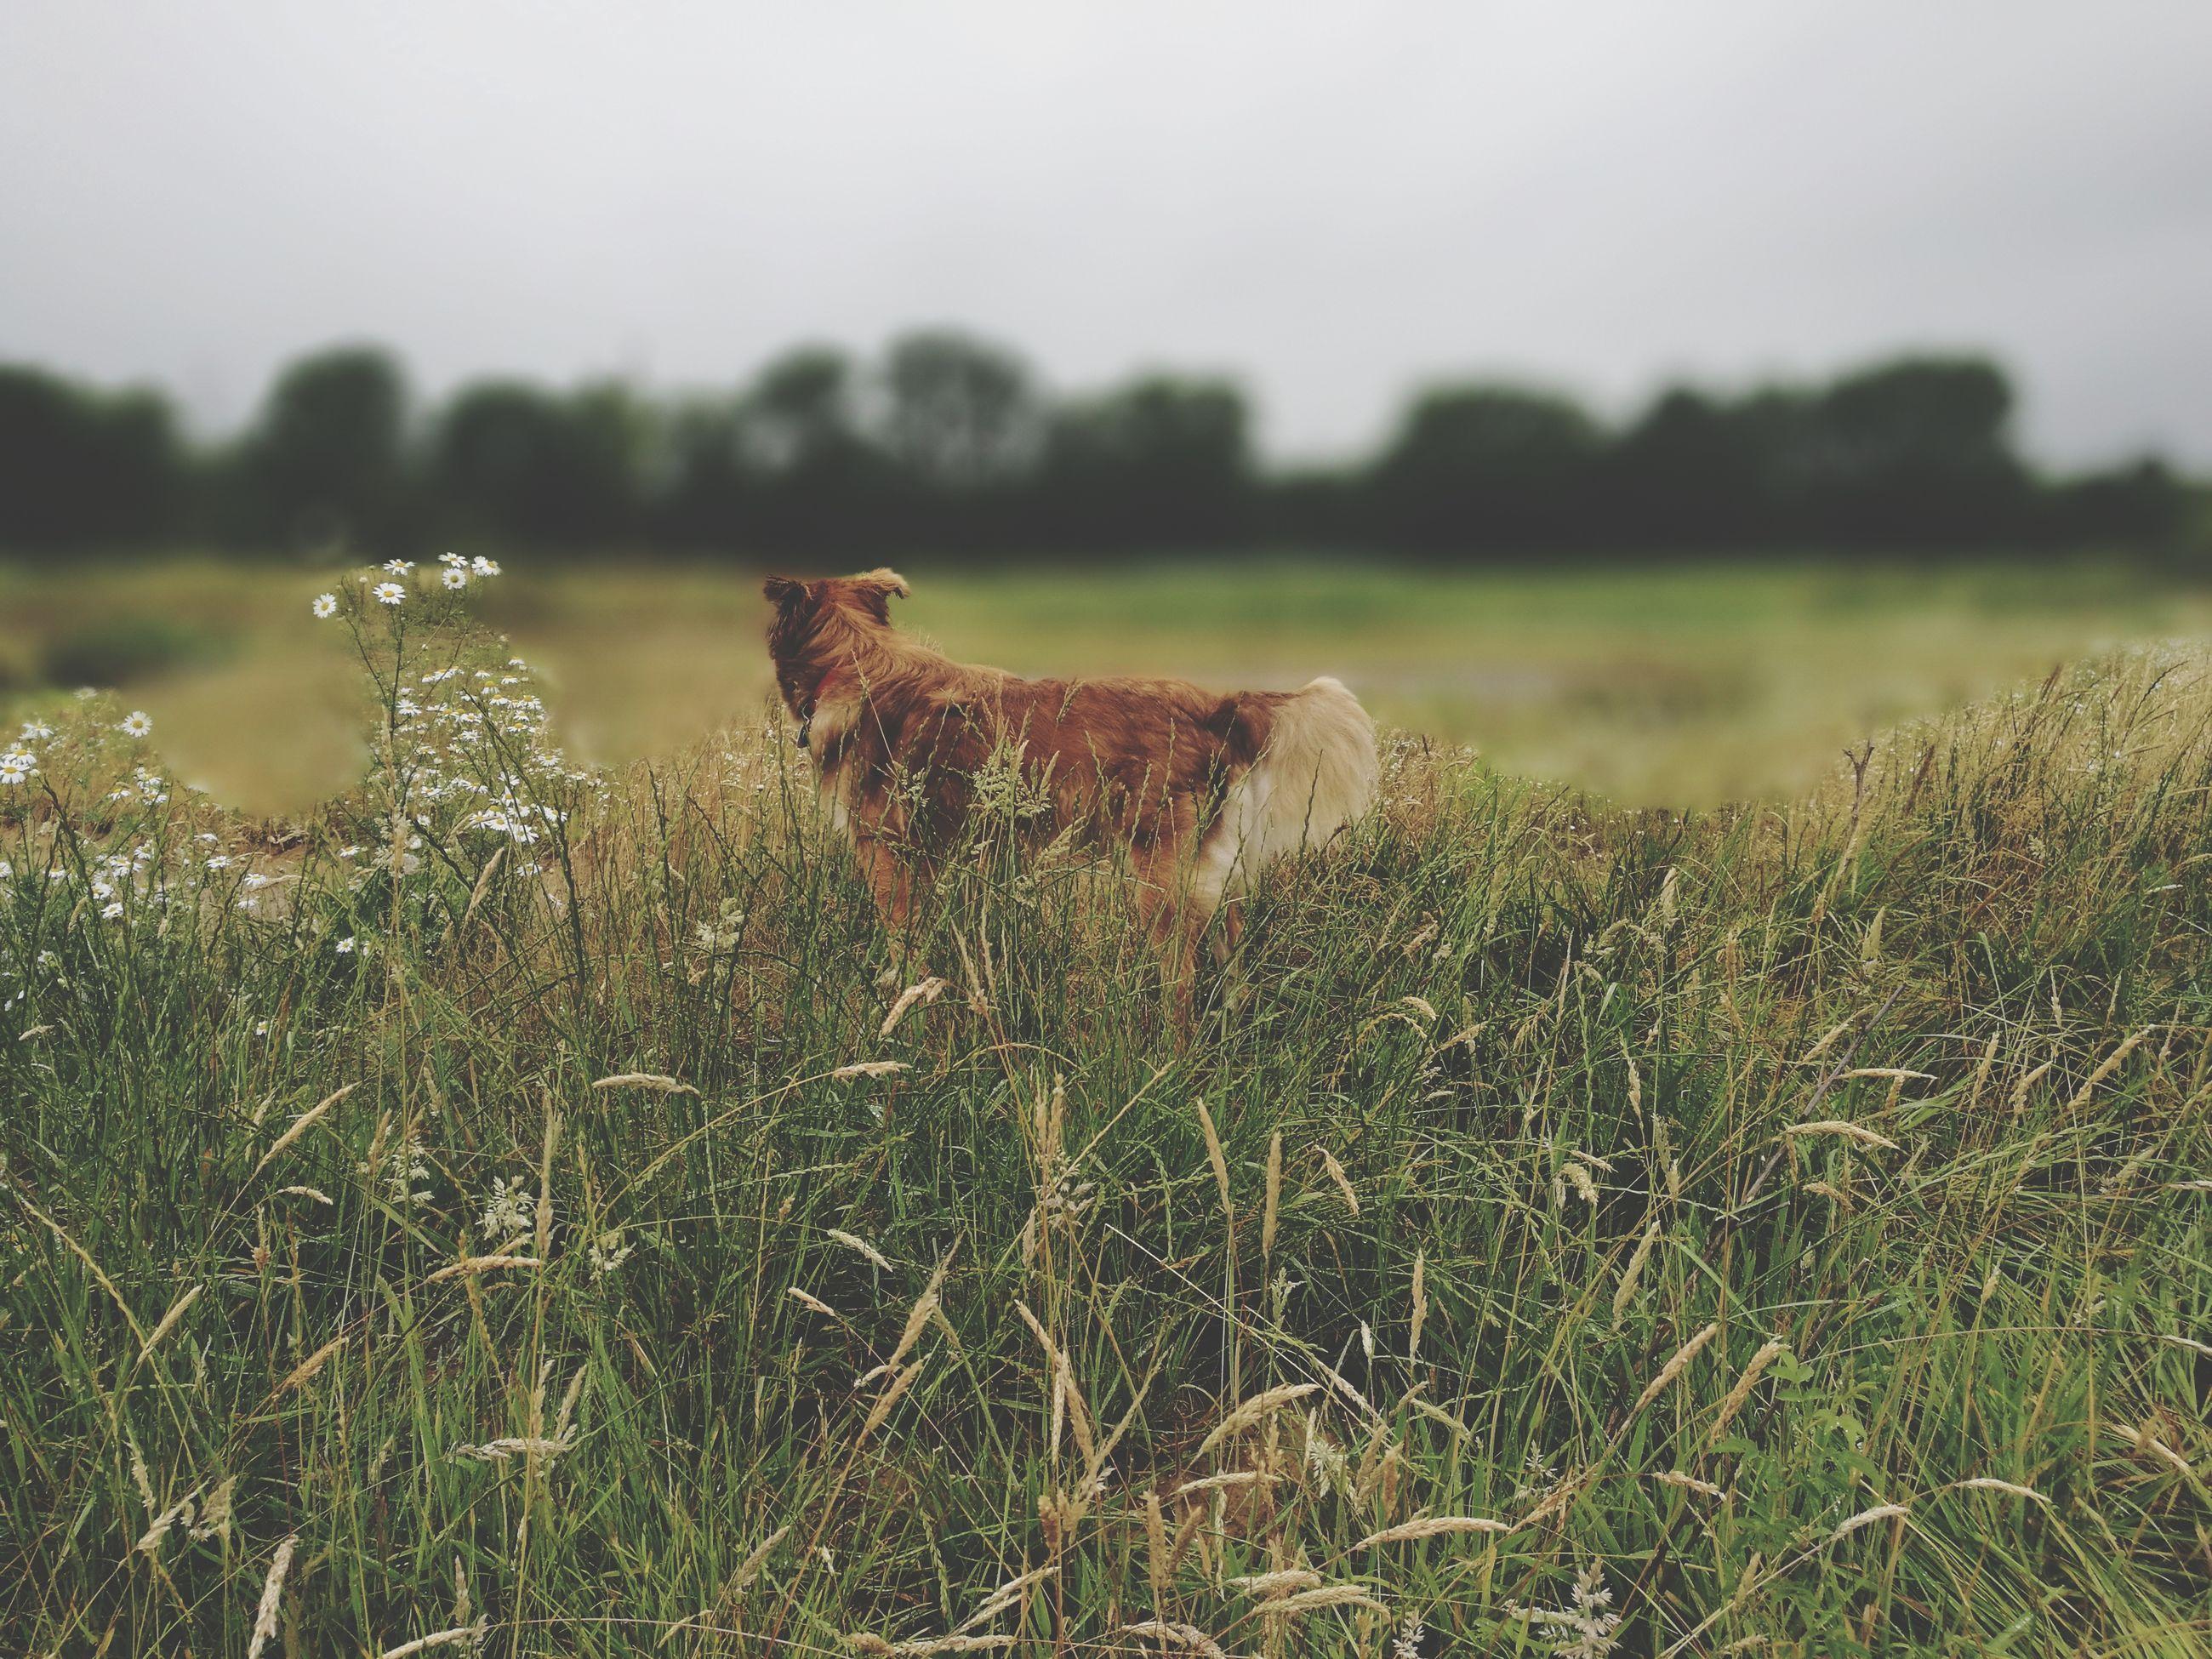 Dog on field in summer